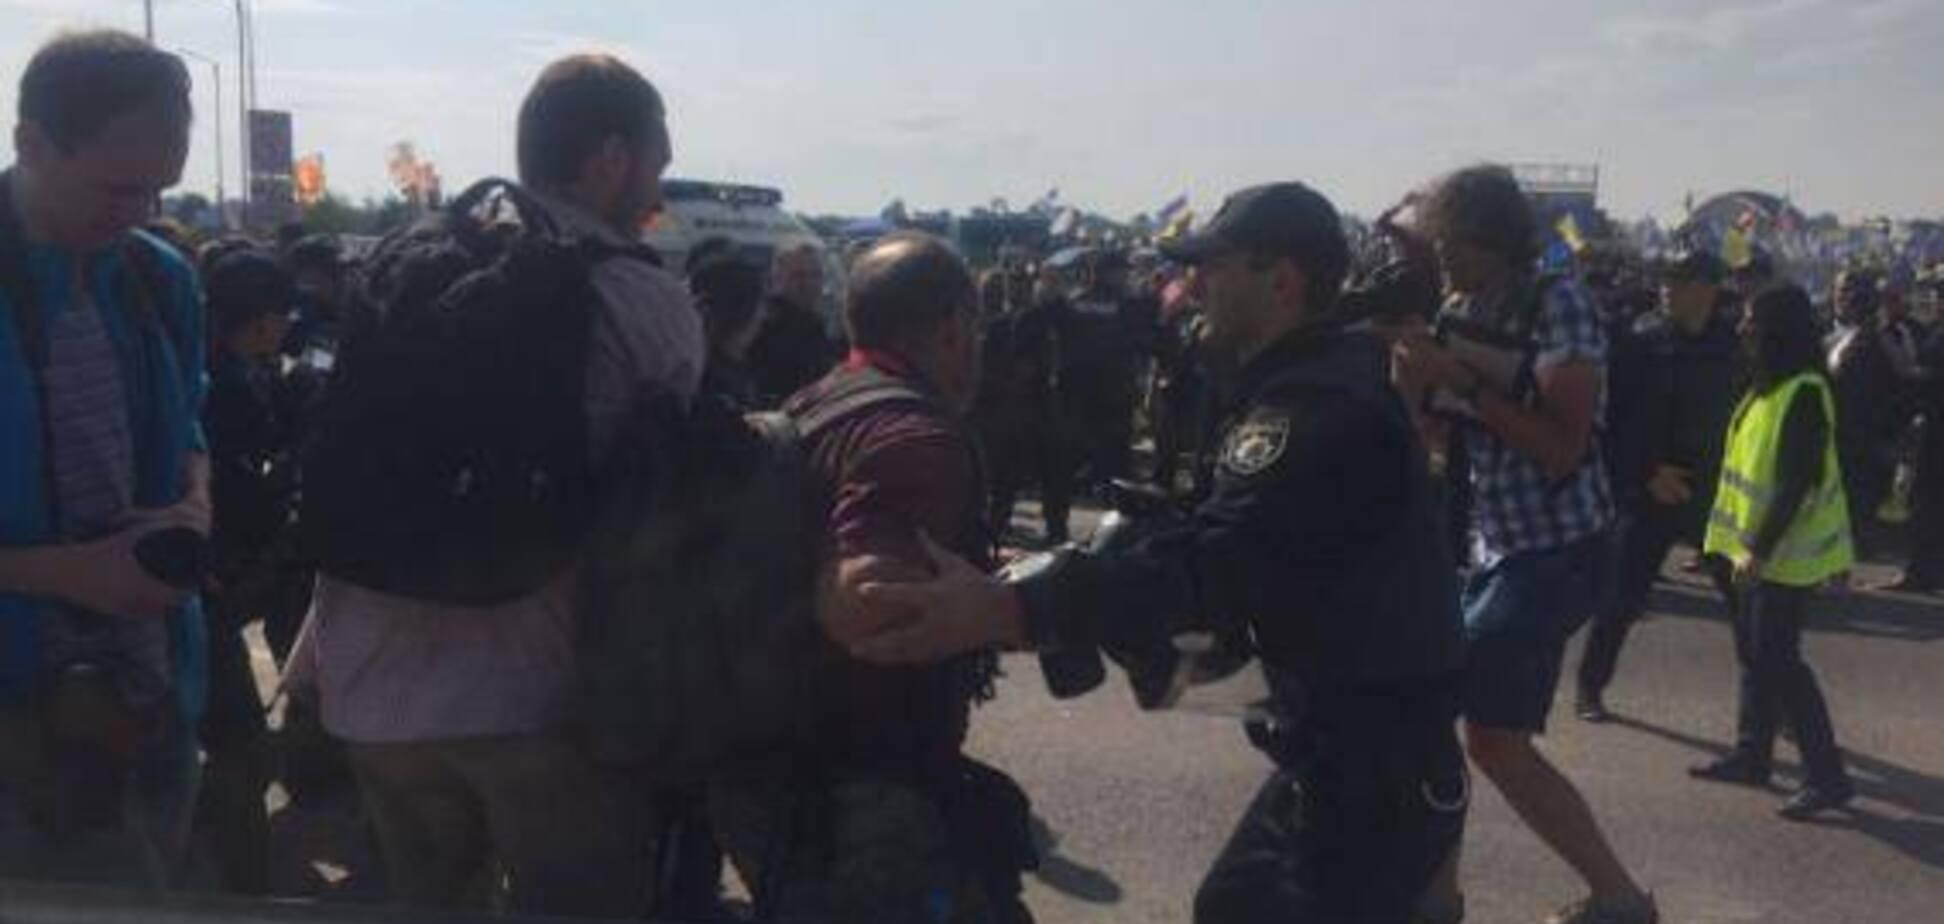 Шли на 'Краковец': полиция задержала и обезоружила более 100 'титушек'